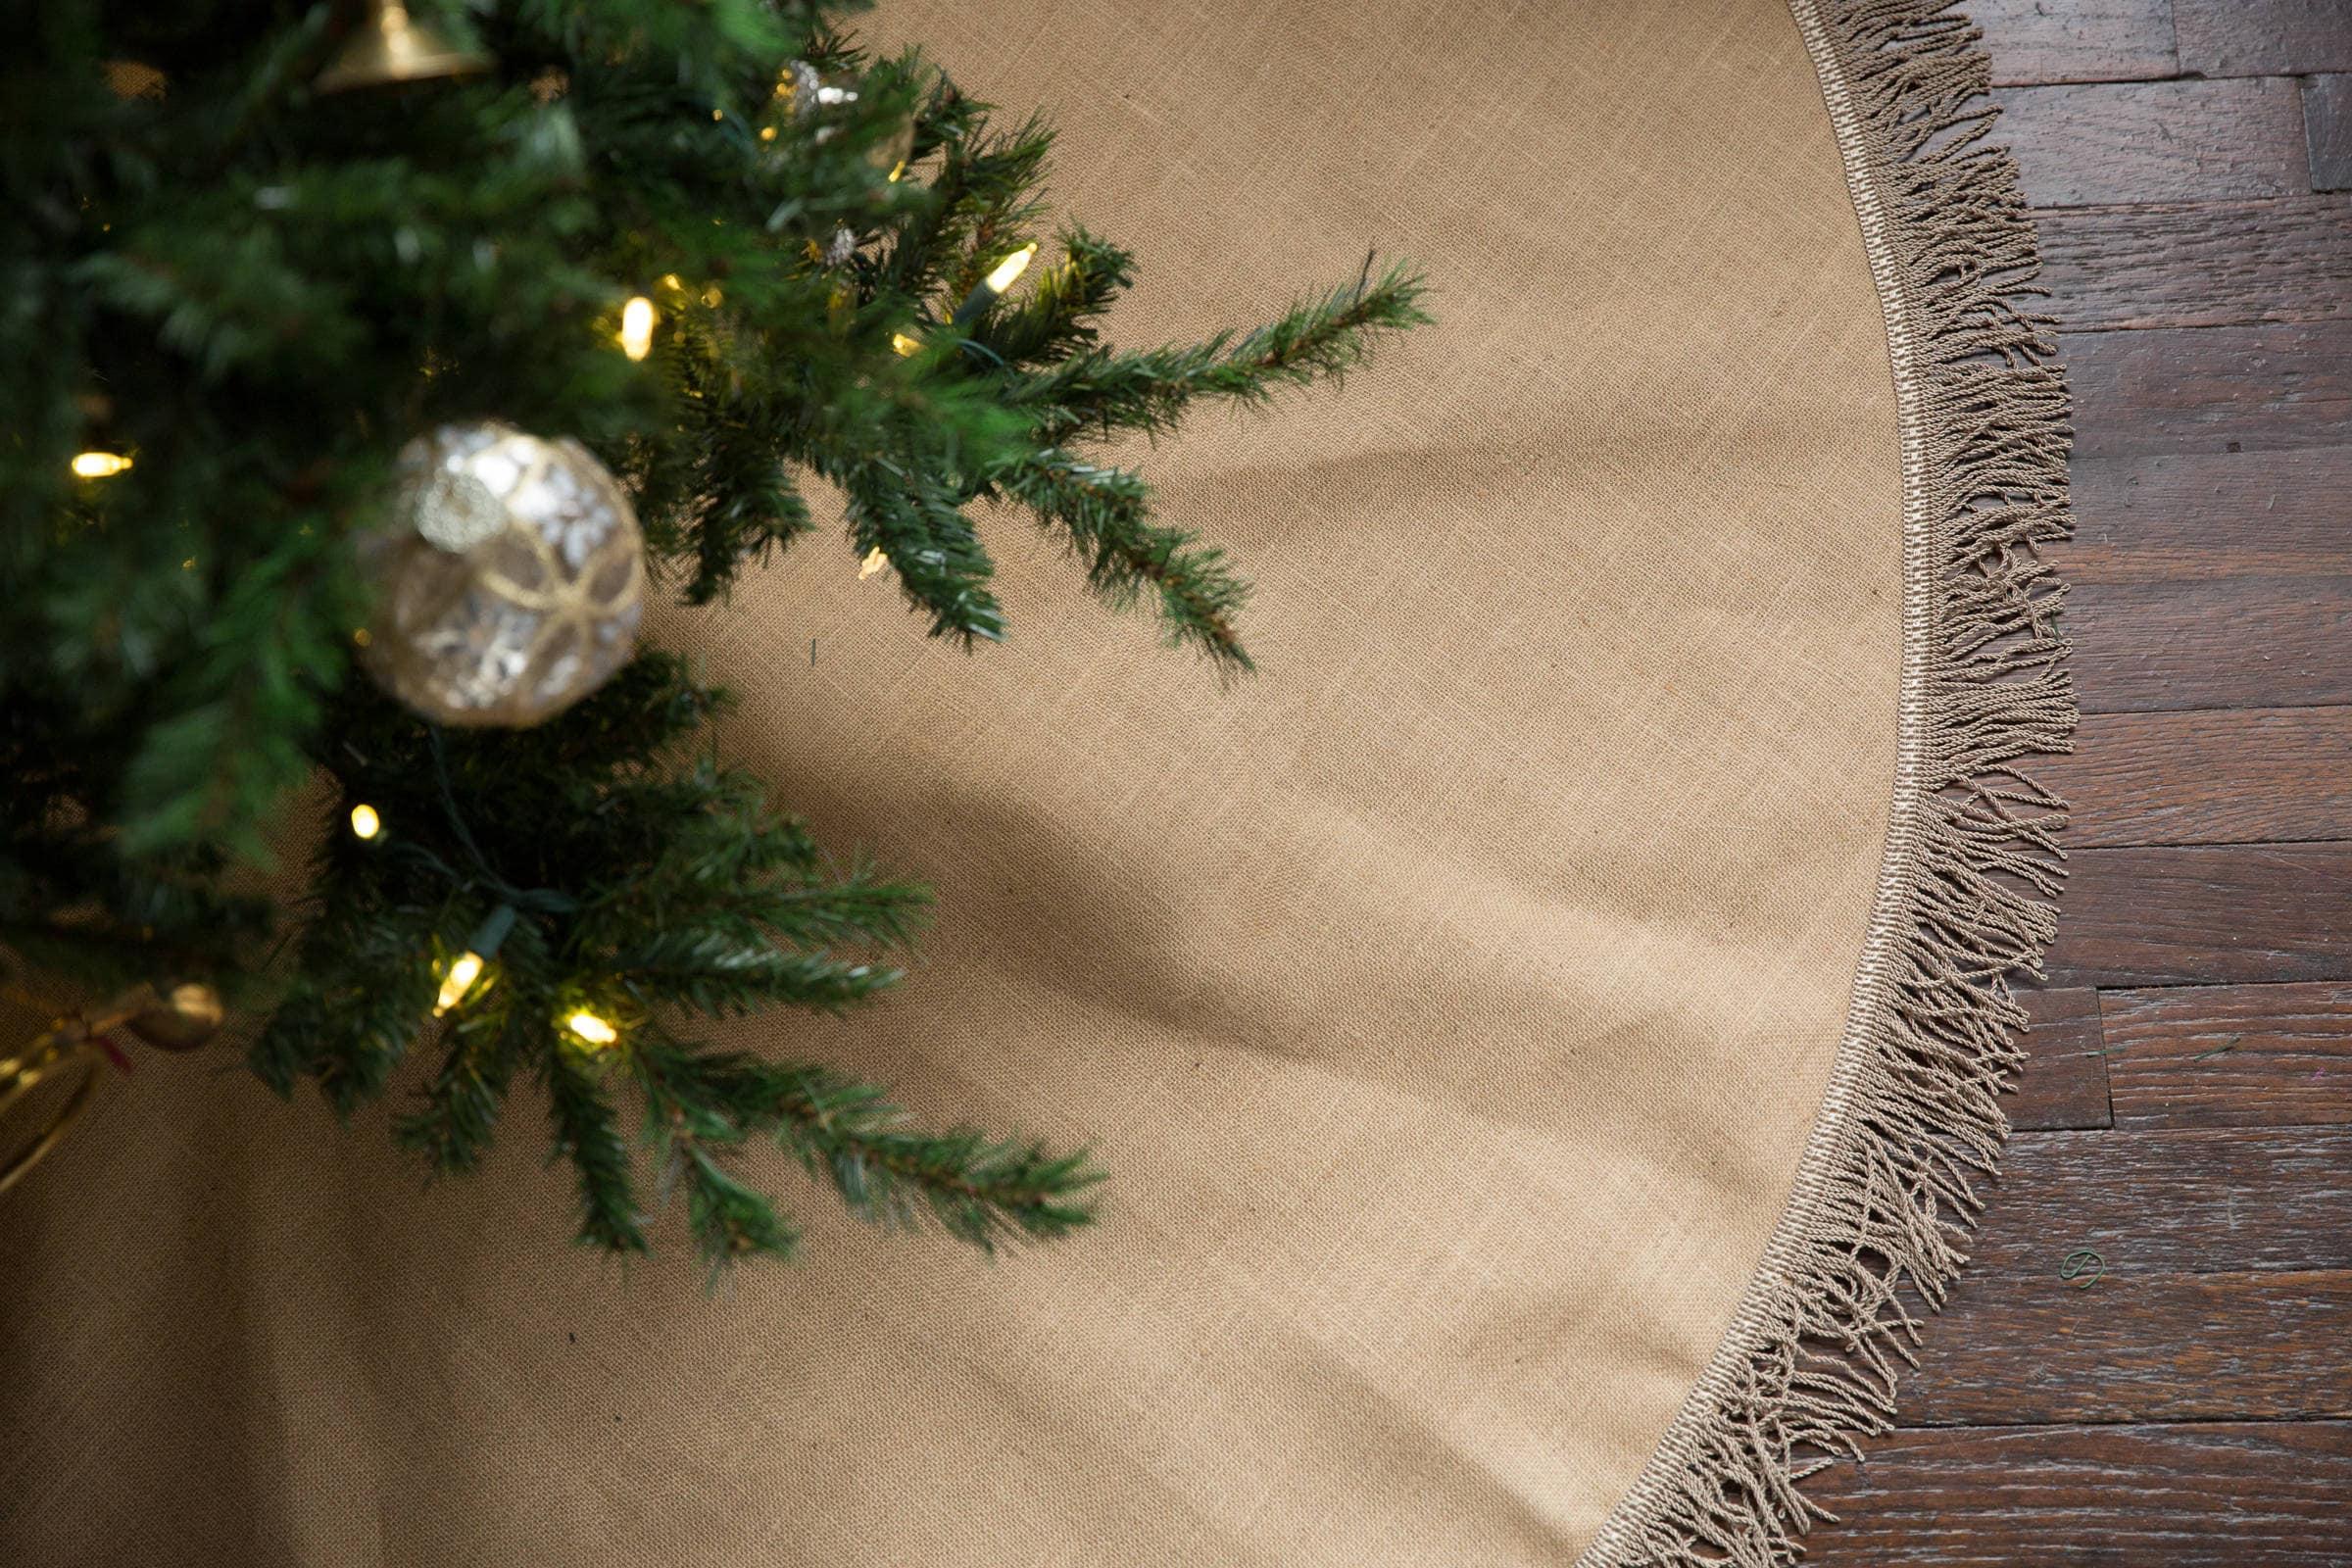 60 Optional Customization Large Burlap Tree Skirt Christmas Tree Skirt with White Pom Pom Trim Approx